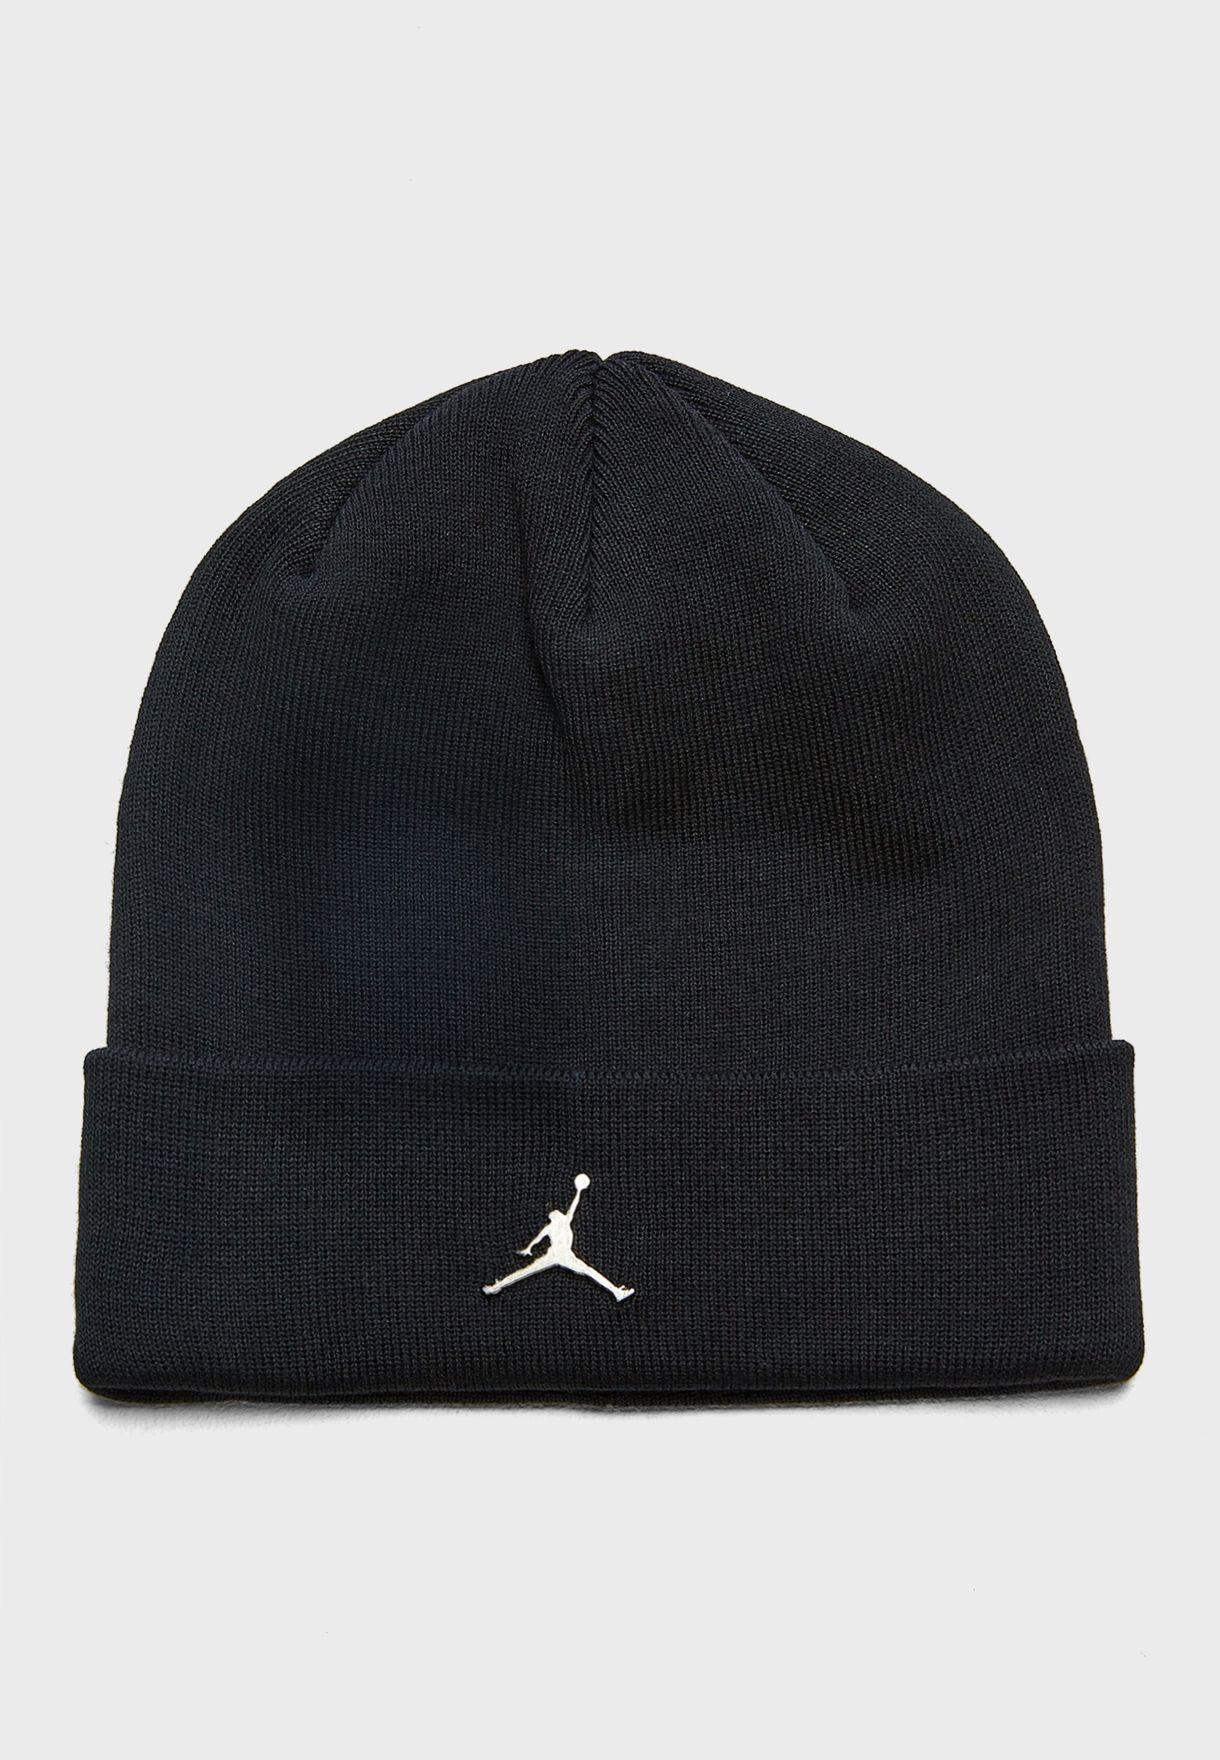 1cf7b21a690 Shop Nike black Jordan Cuffed Beanie AA1297-010 for Men in Saudi ...